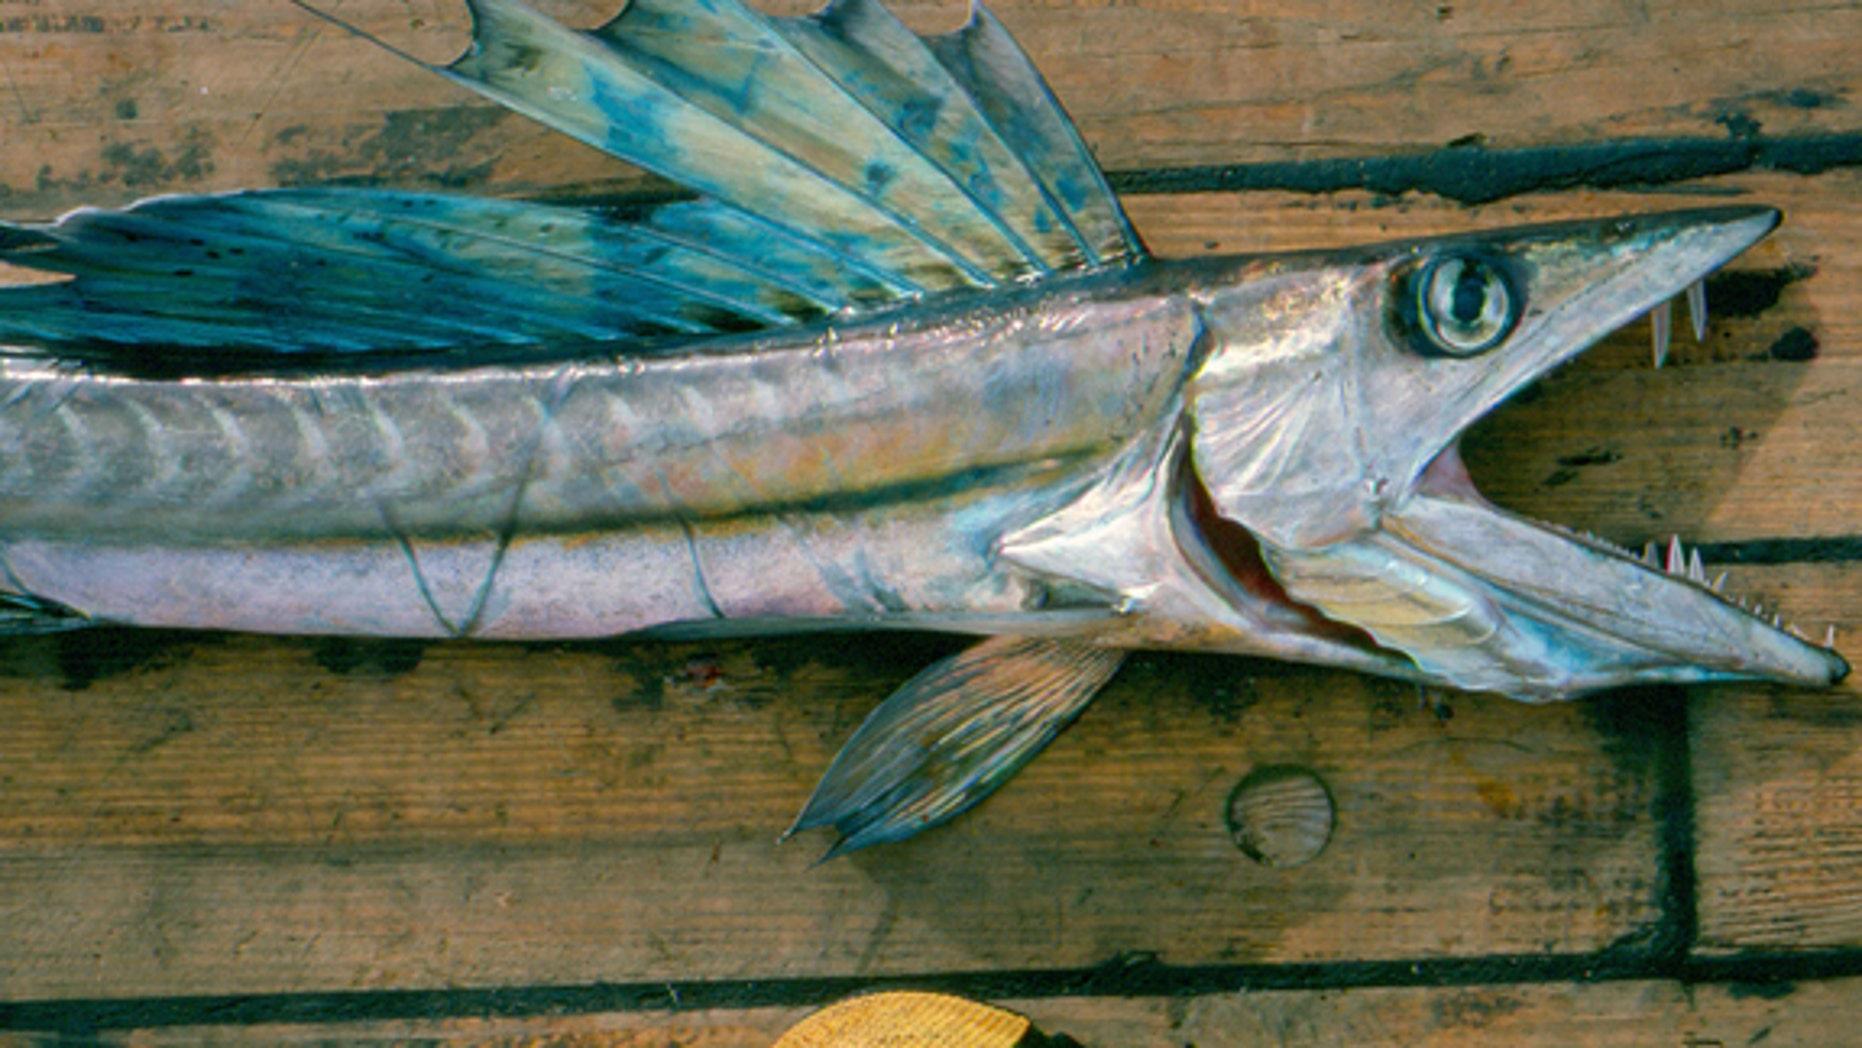 A long-snouted lancetfish (Alepisaurus ferox).